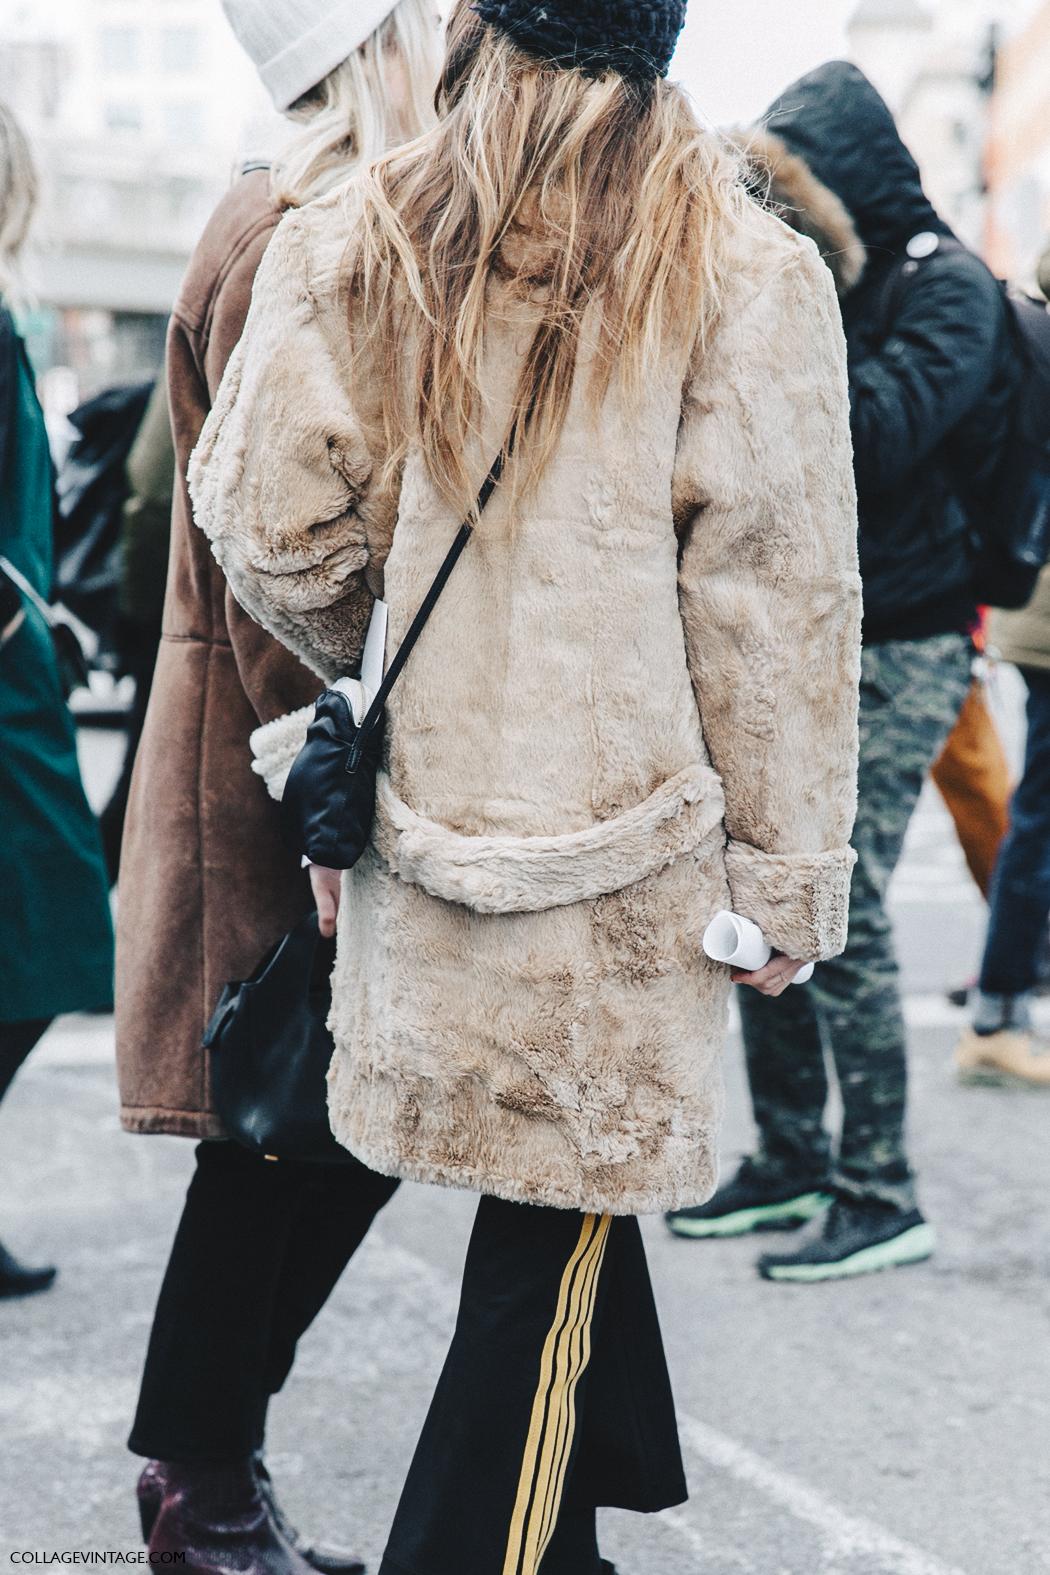 NYFW-New_York_Fashion_Week-Fall_Winter-17-Street_Style-Furry_Coat-